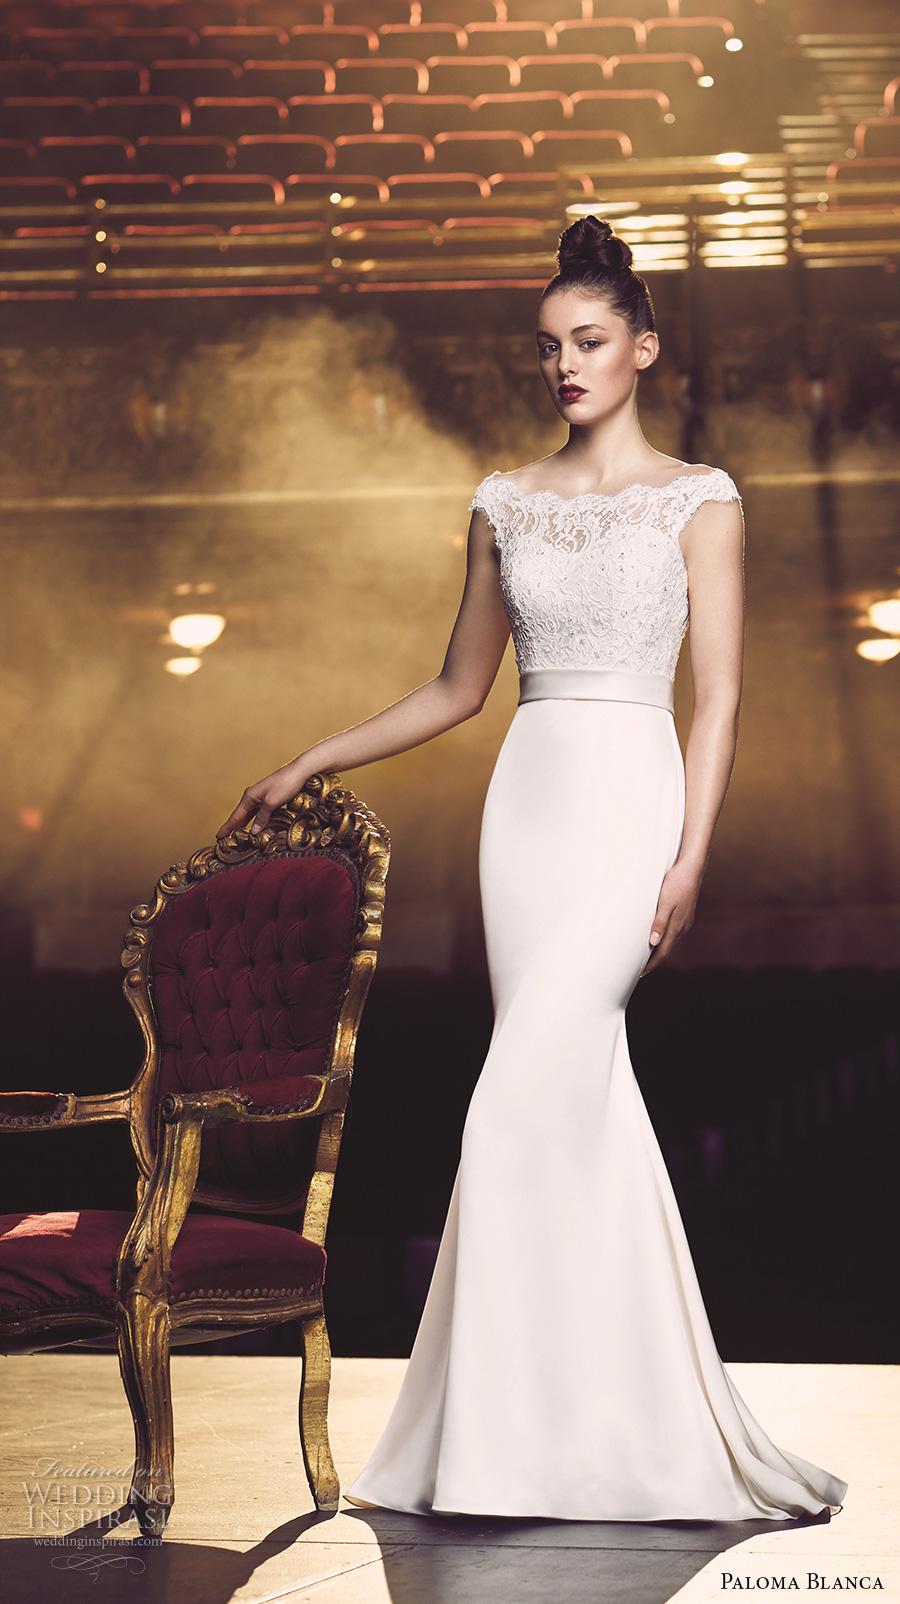 Paloma Blanca Wedding Dresses For Sale 43 Good paloma blanca fall bridal